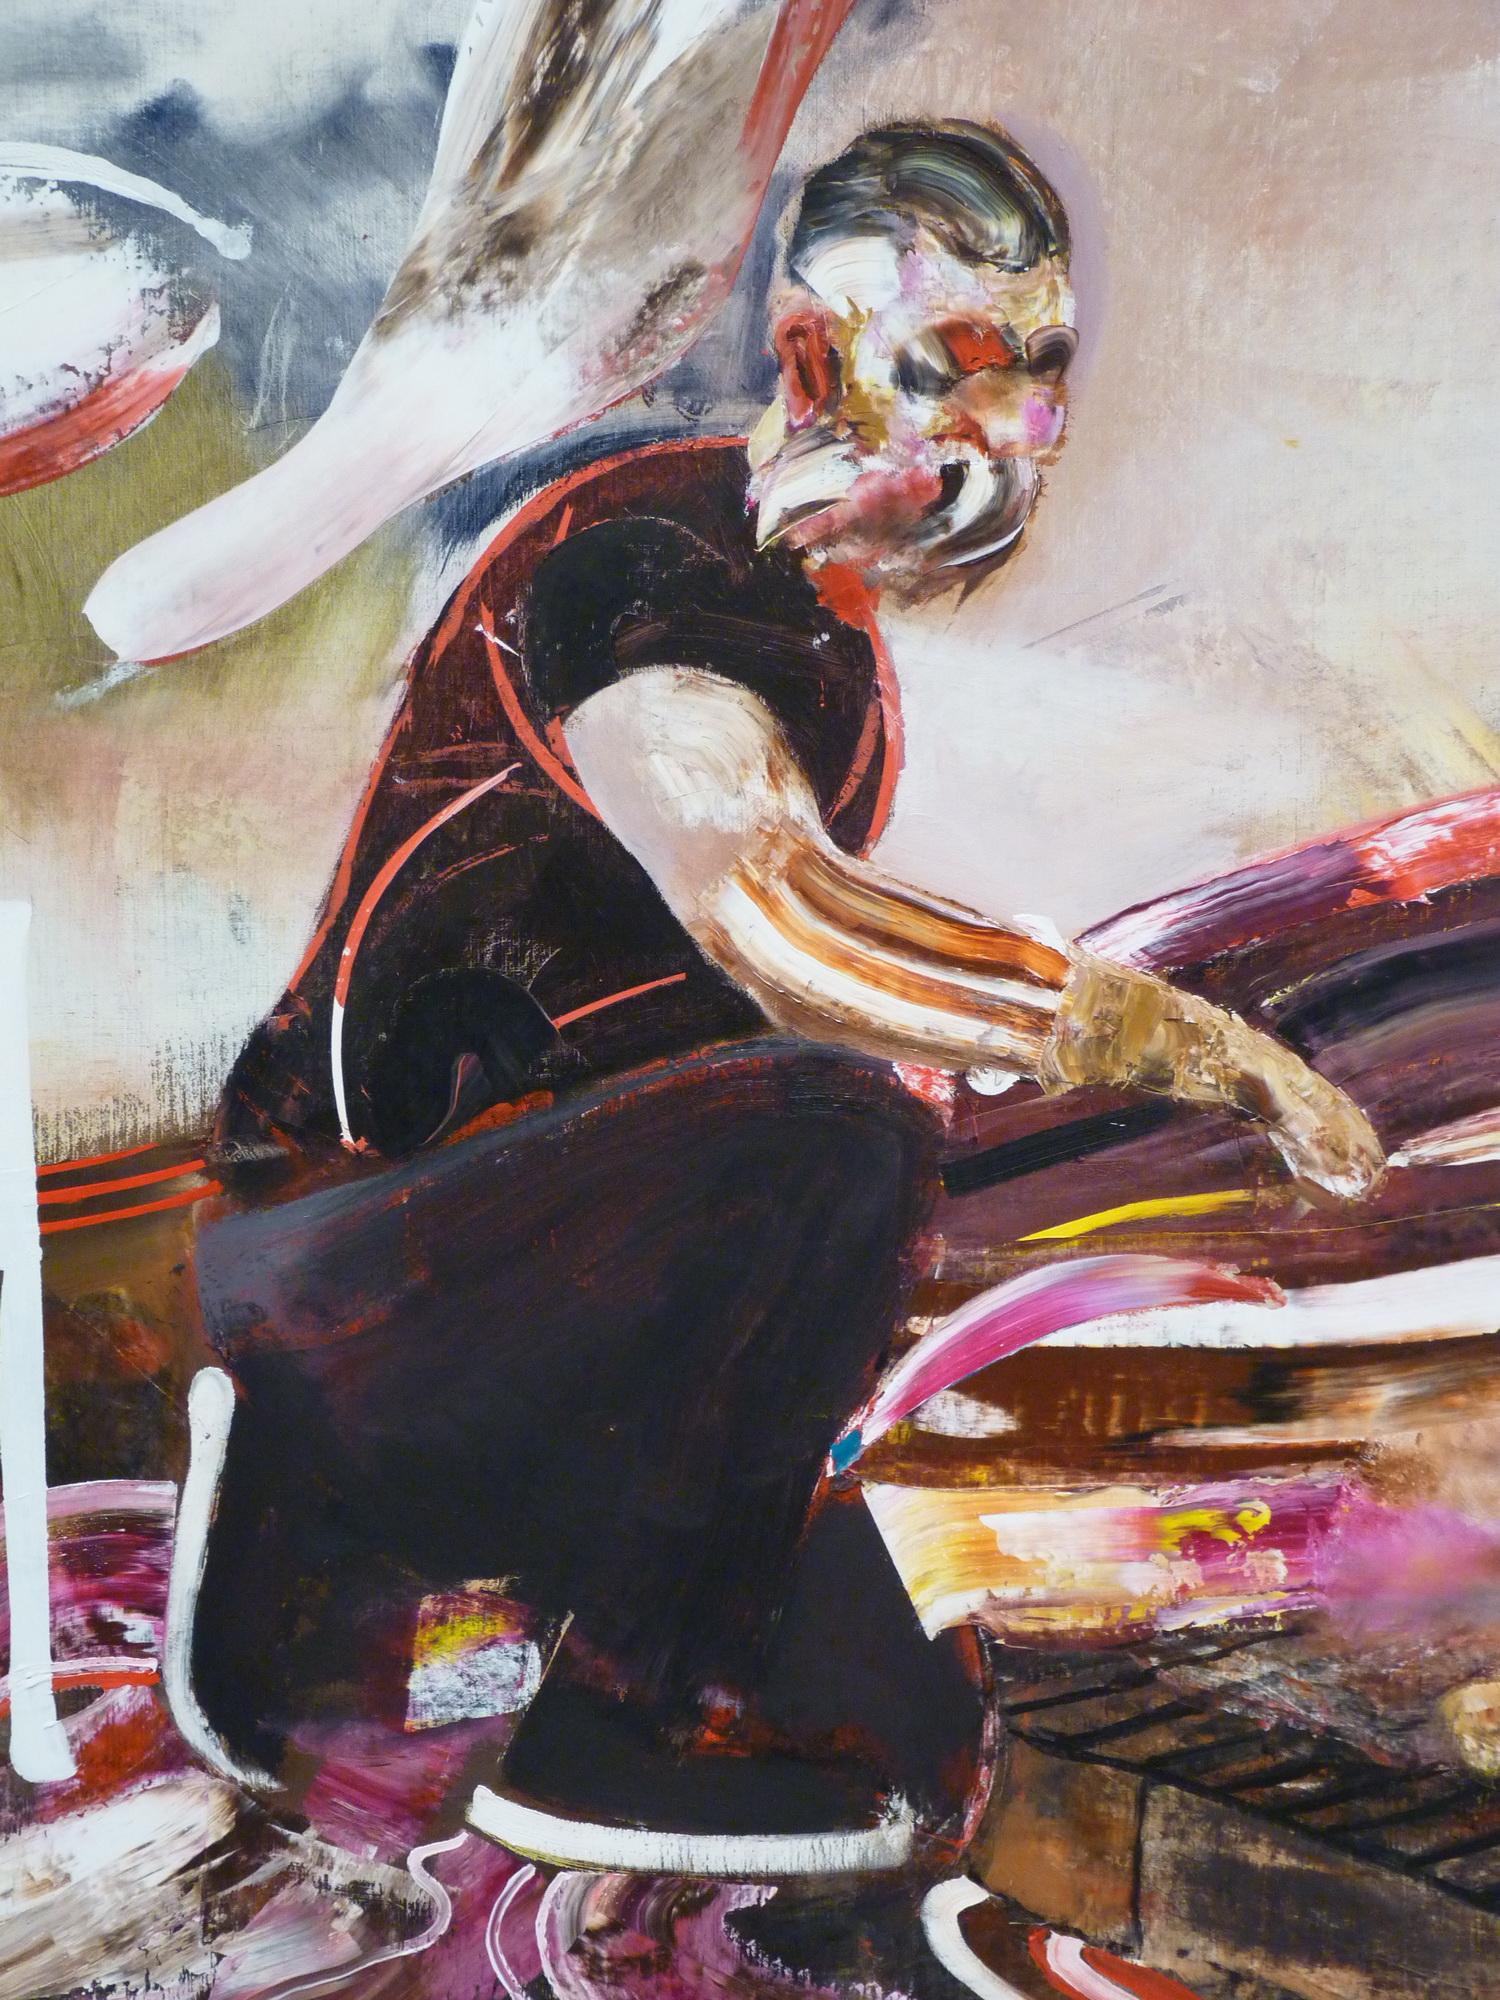 019-4  Adrian Ghenie  ne1977   self-portrait  230x160cm 2015 huile sur toile